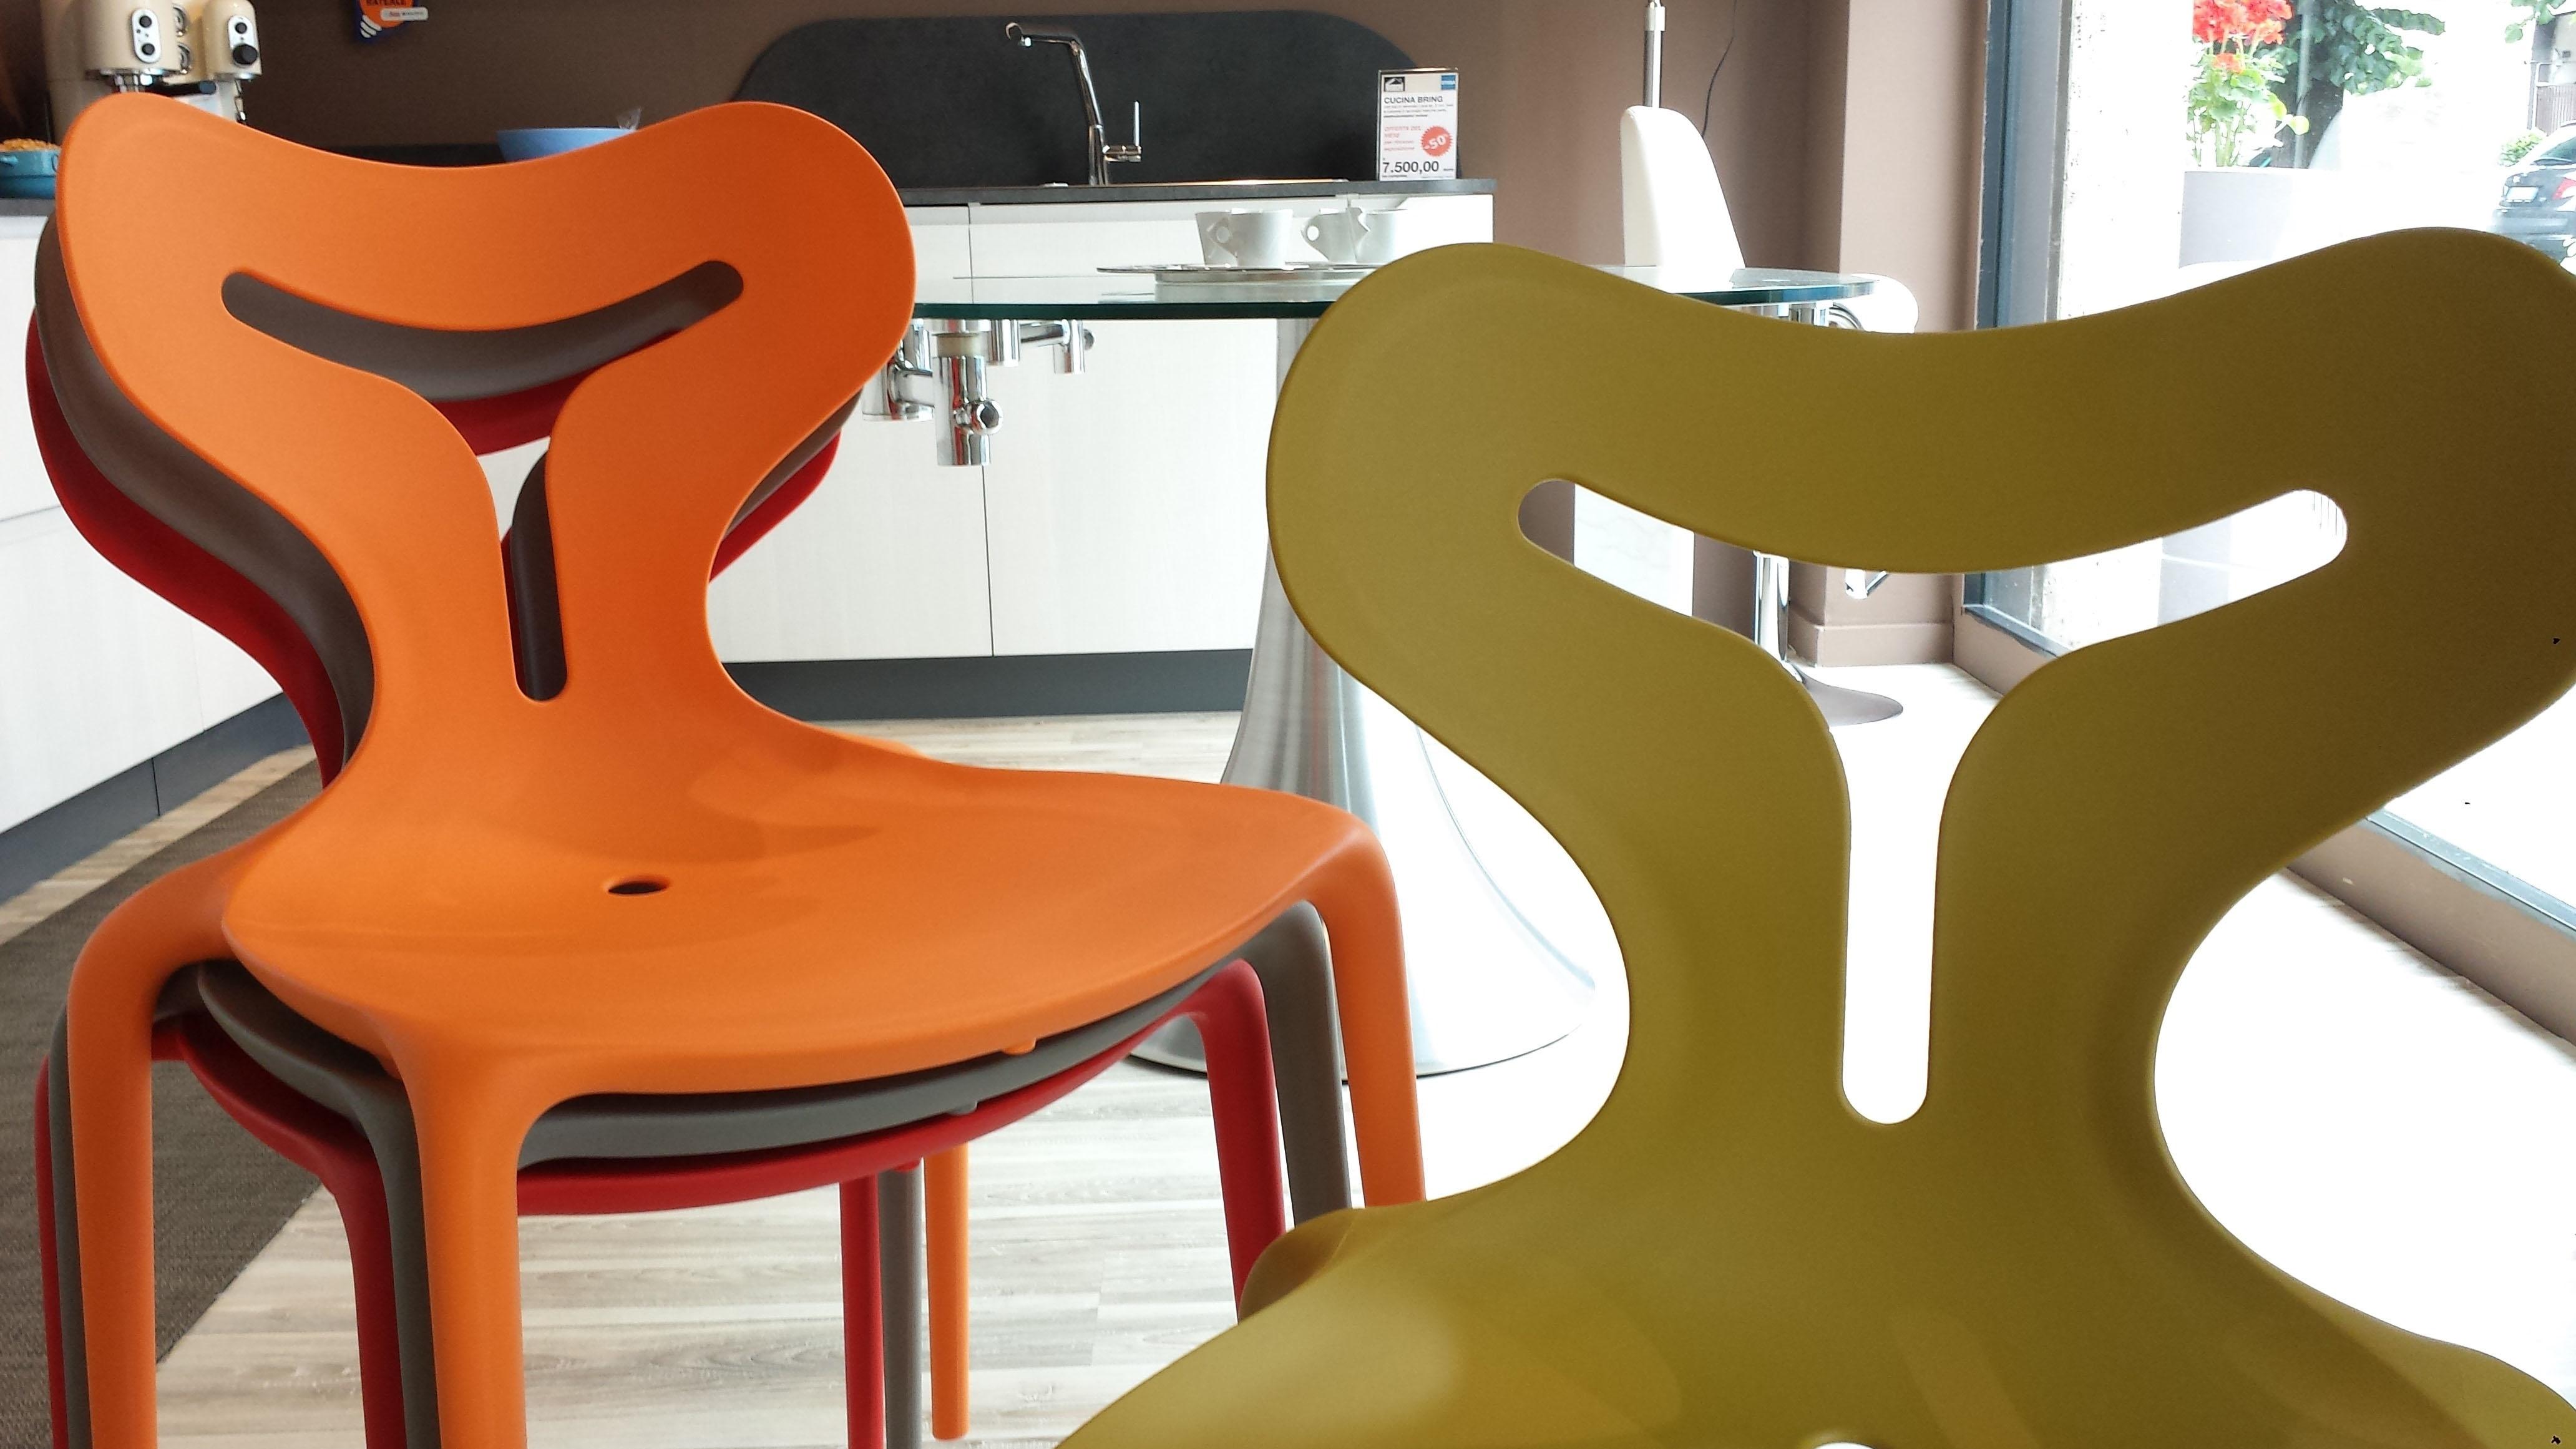 Calligaris sedia area 51 sedie a prezzi scontati for 4 sedie in offerta